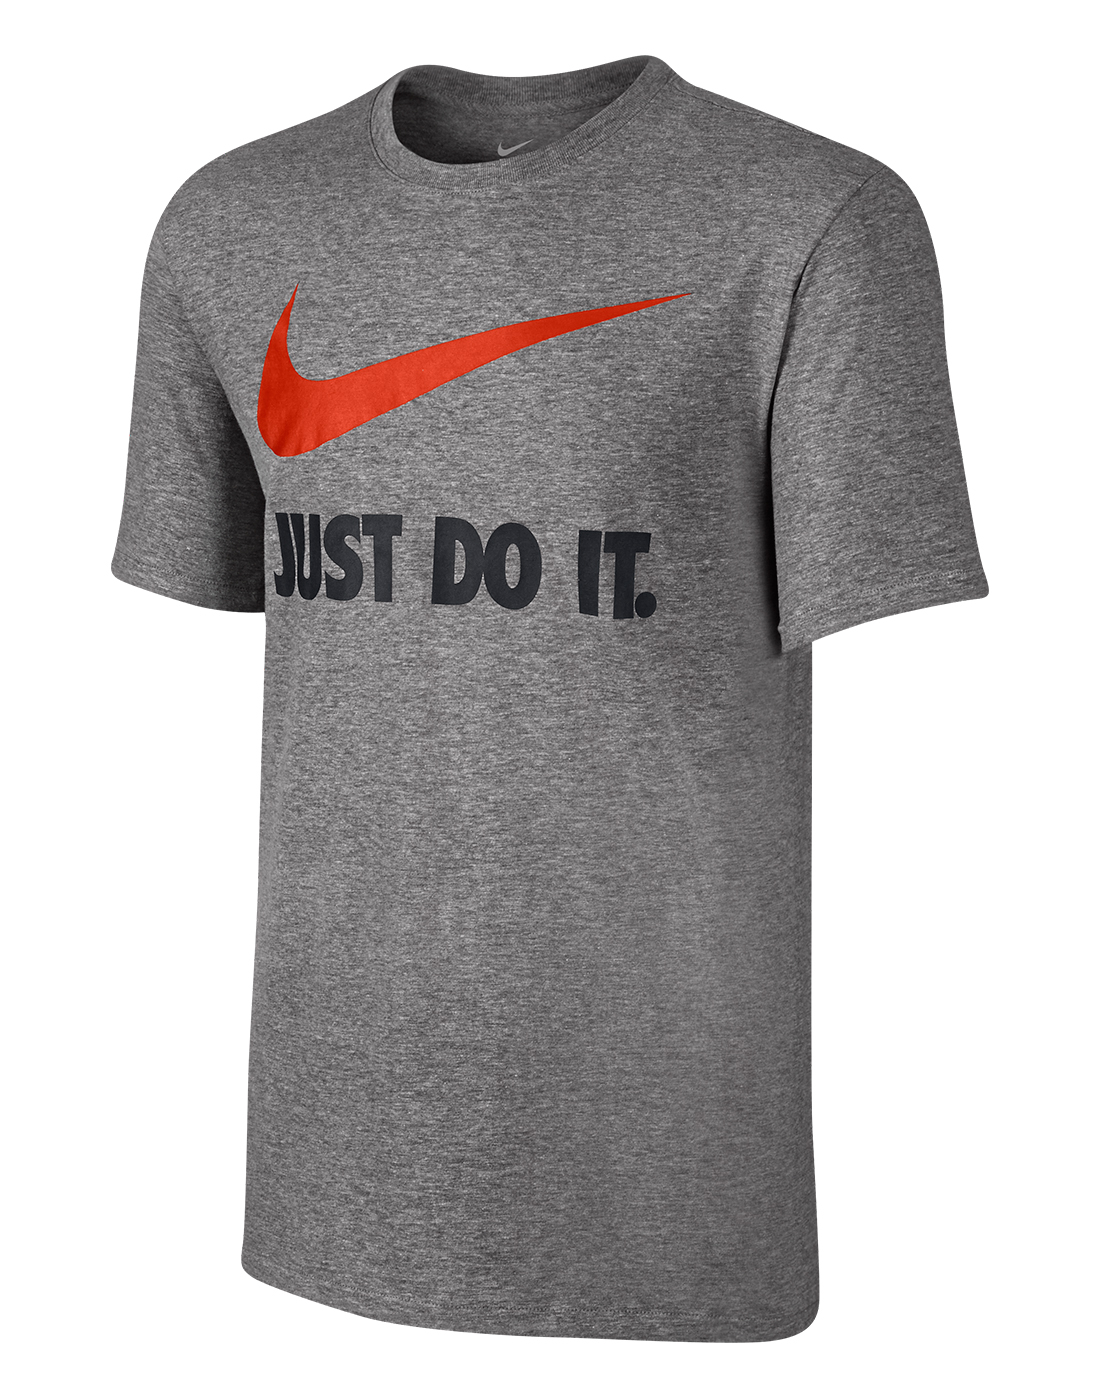 Nike T Shirt Just Do It Men's Grey ...